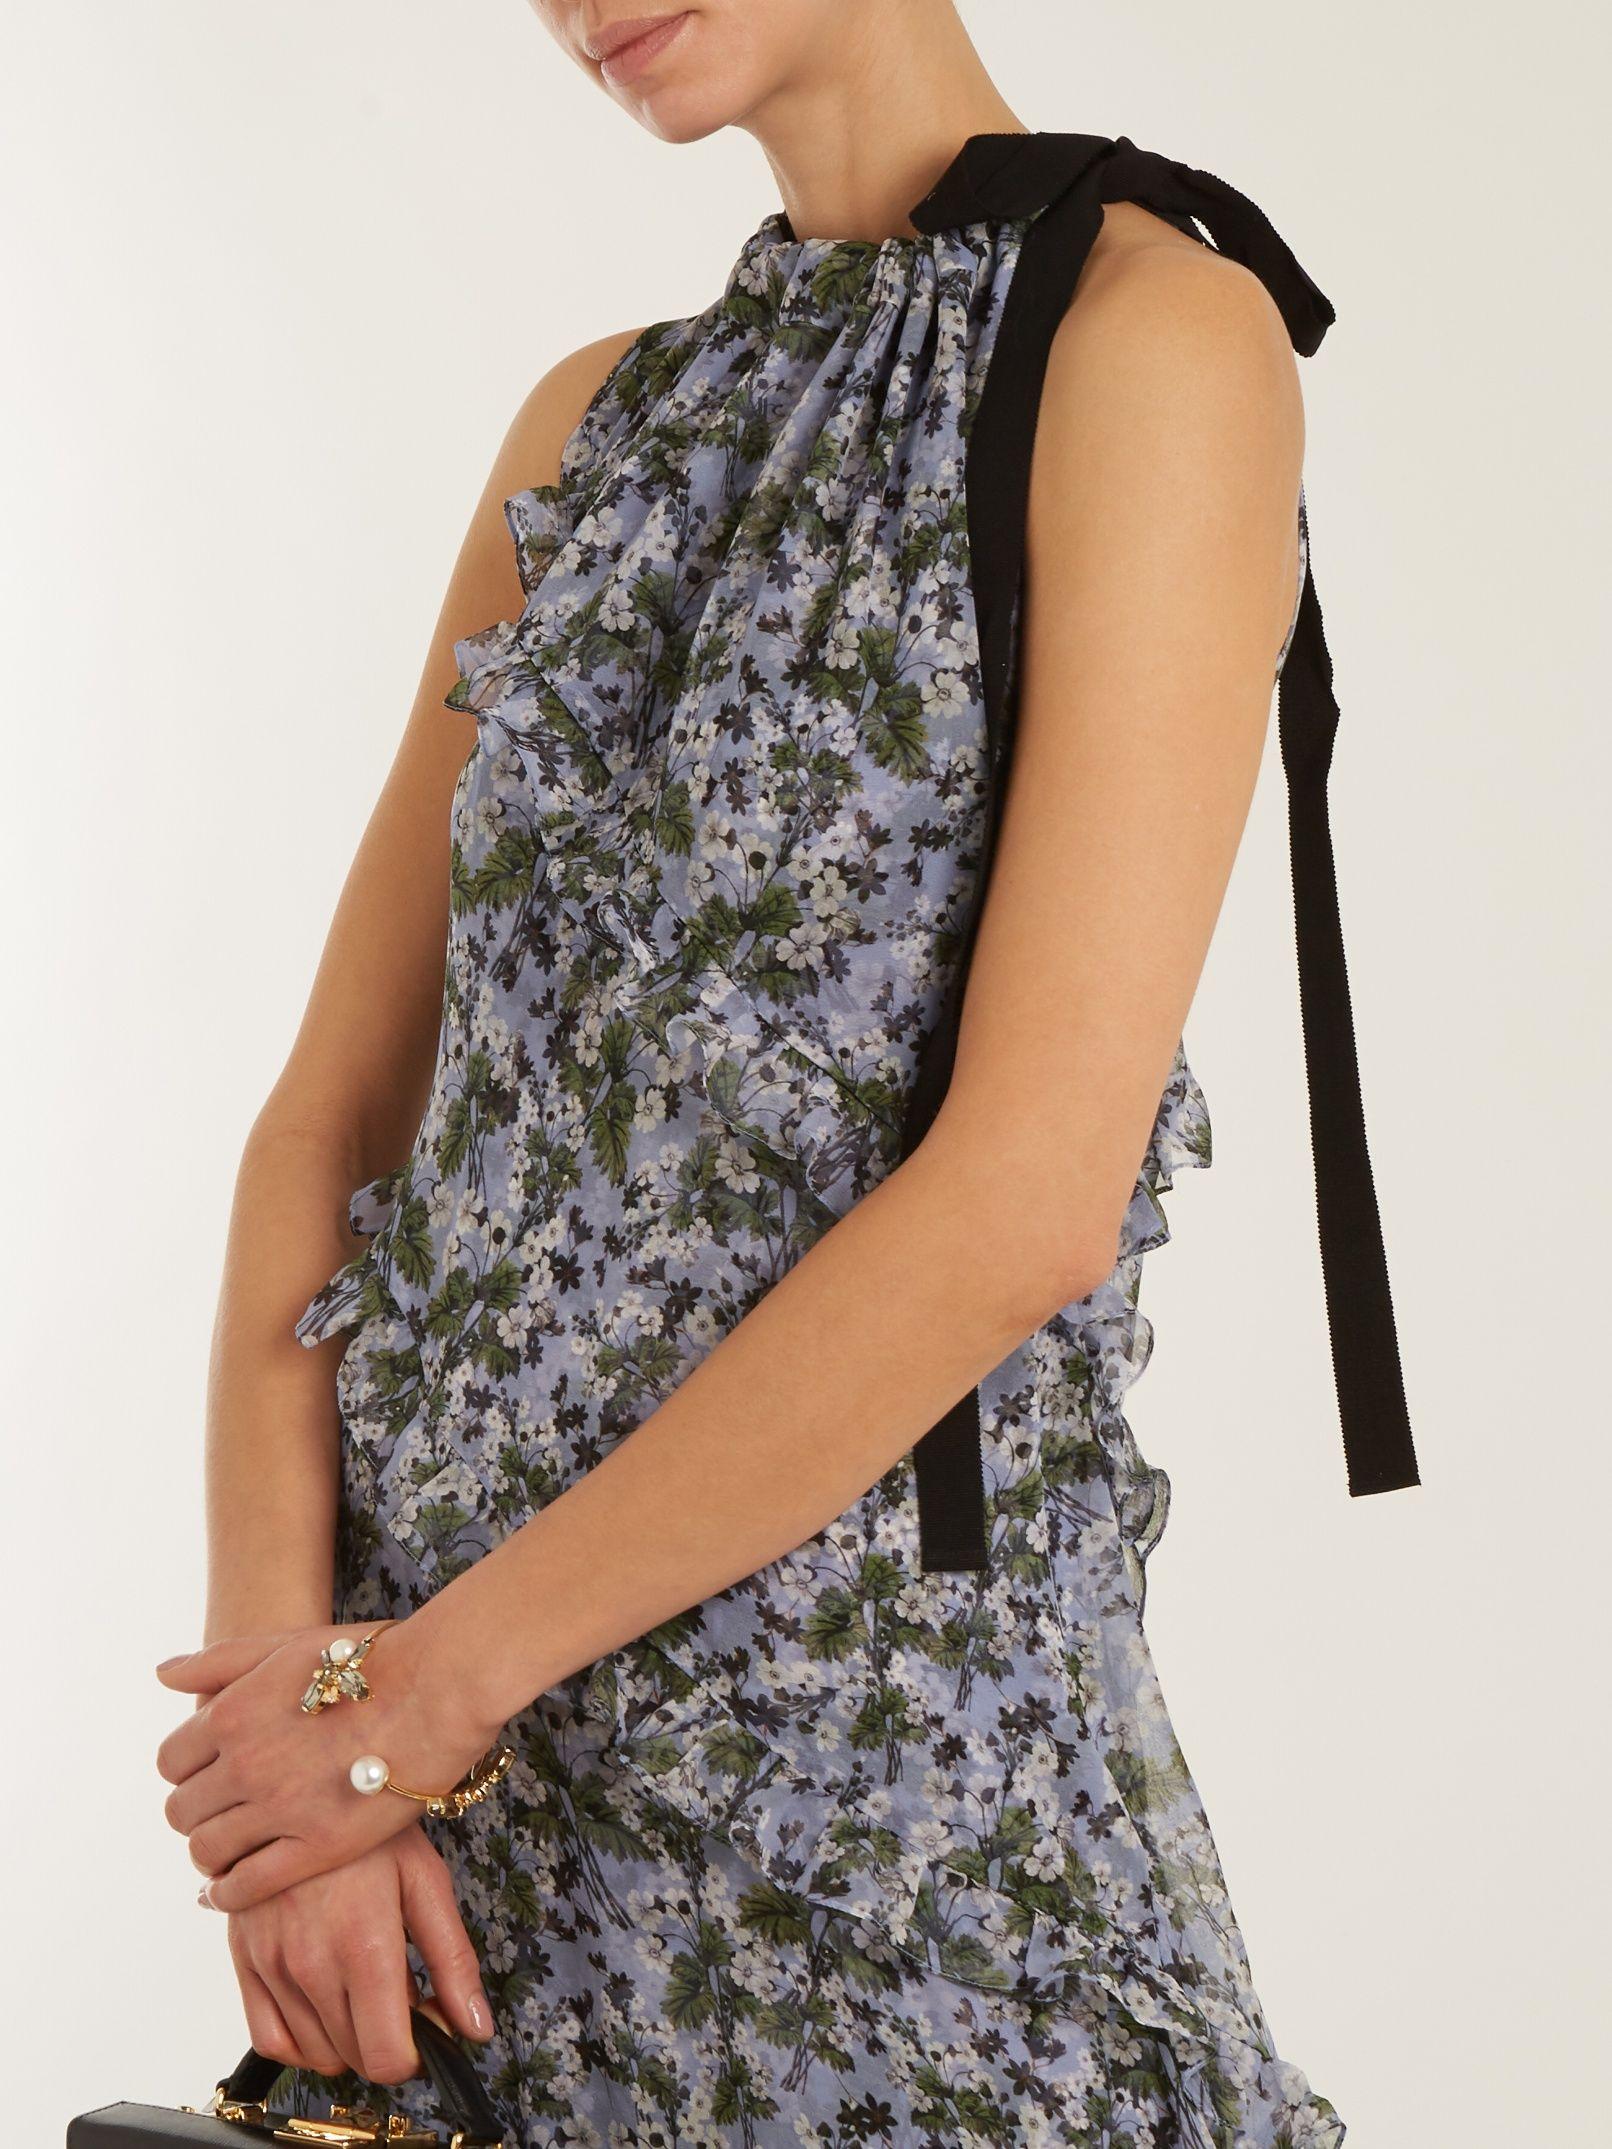 Discount Countdown Package Zandra drawstring-neck silk-georgette dress Erdem Huge Surprise Cheap Online Buy Cheap Authentic NUIWh3uMa